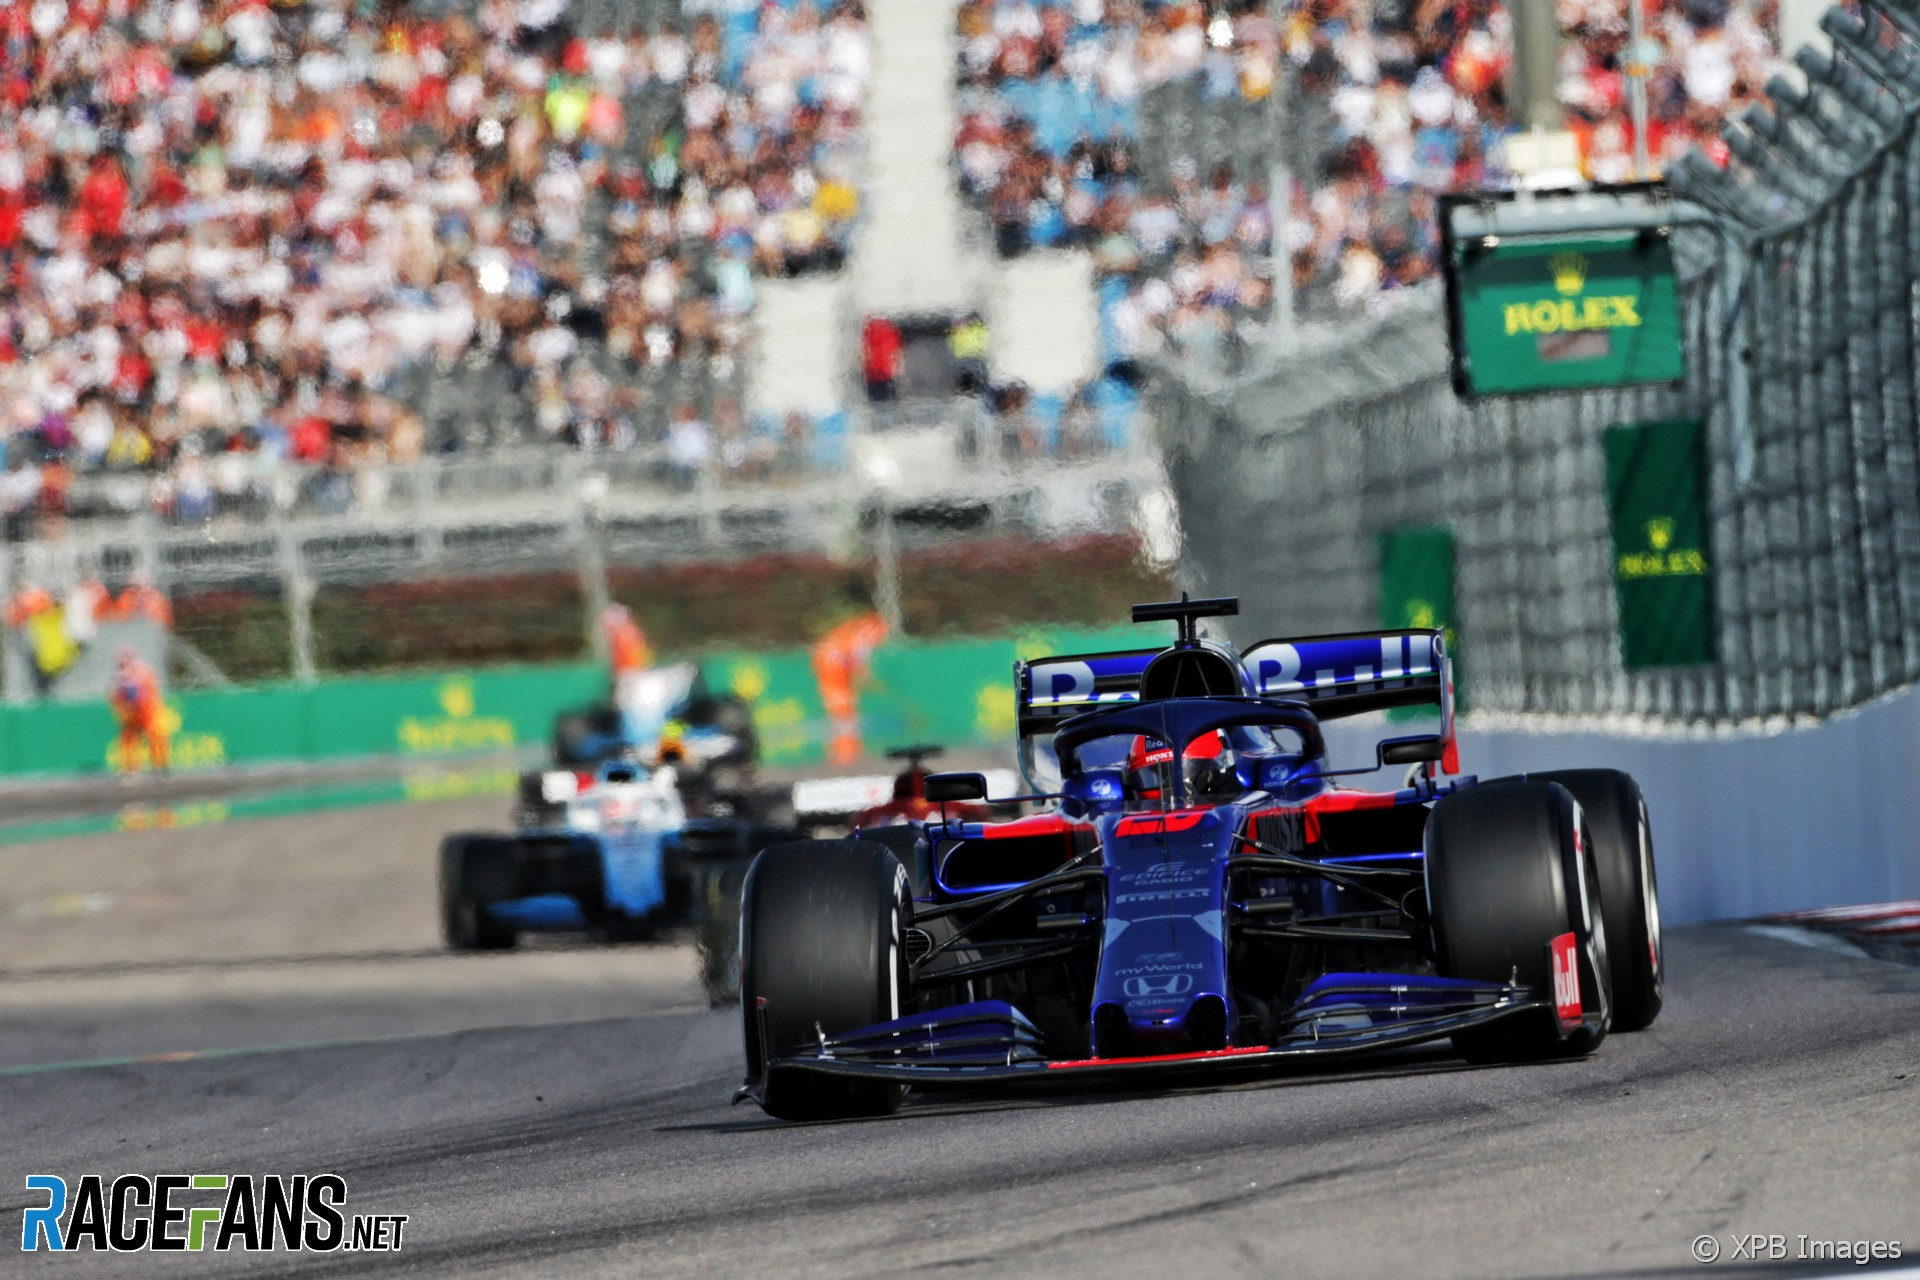 Daniil Kvyat, Toro Rosso, Sochi Autodrom, 2019